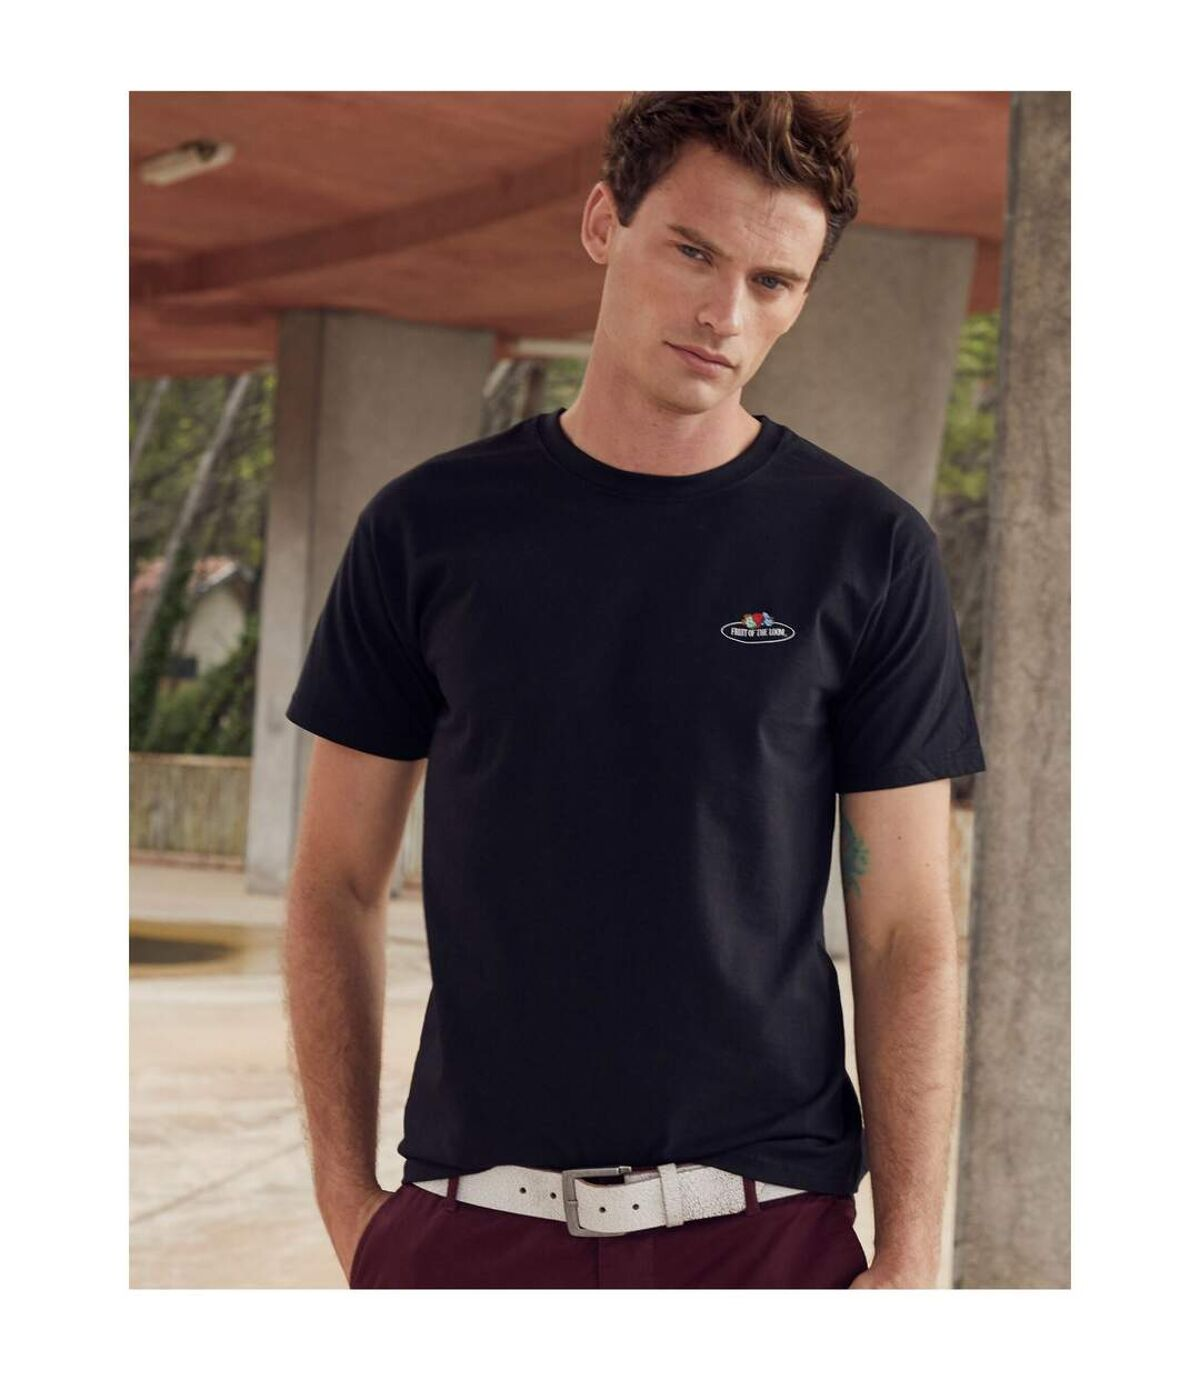 Fruit of the Loom Mens Vintage Logo T-Shirt (Black) - UTBC4818